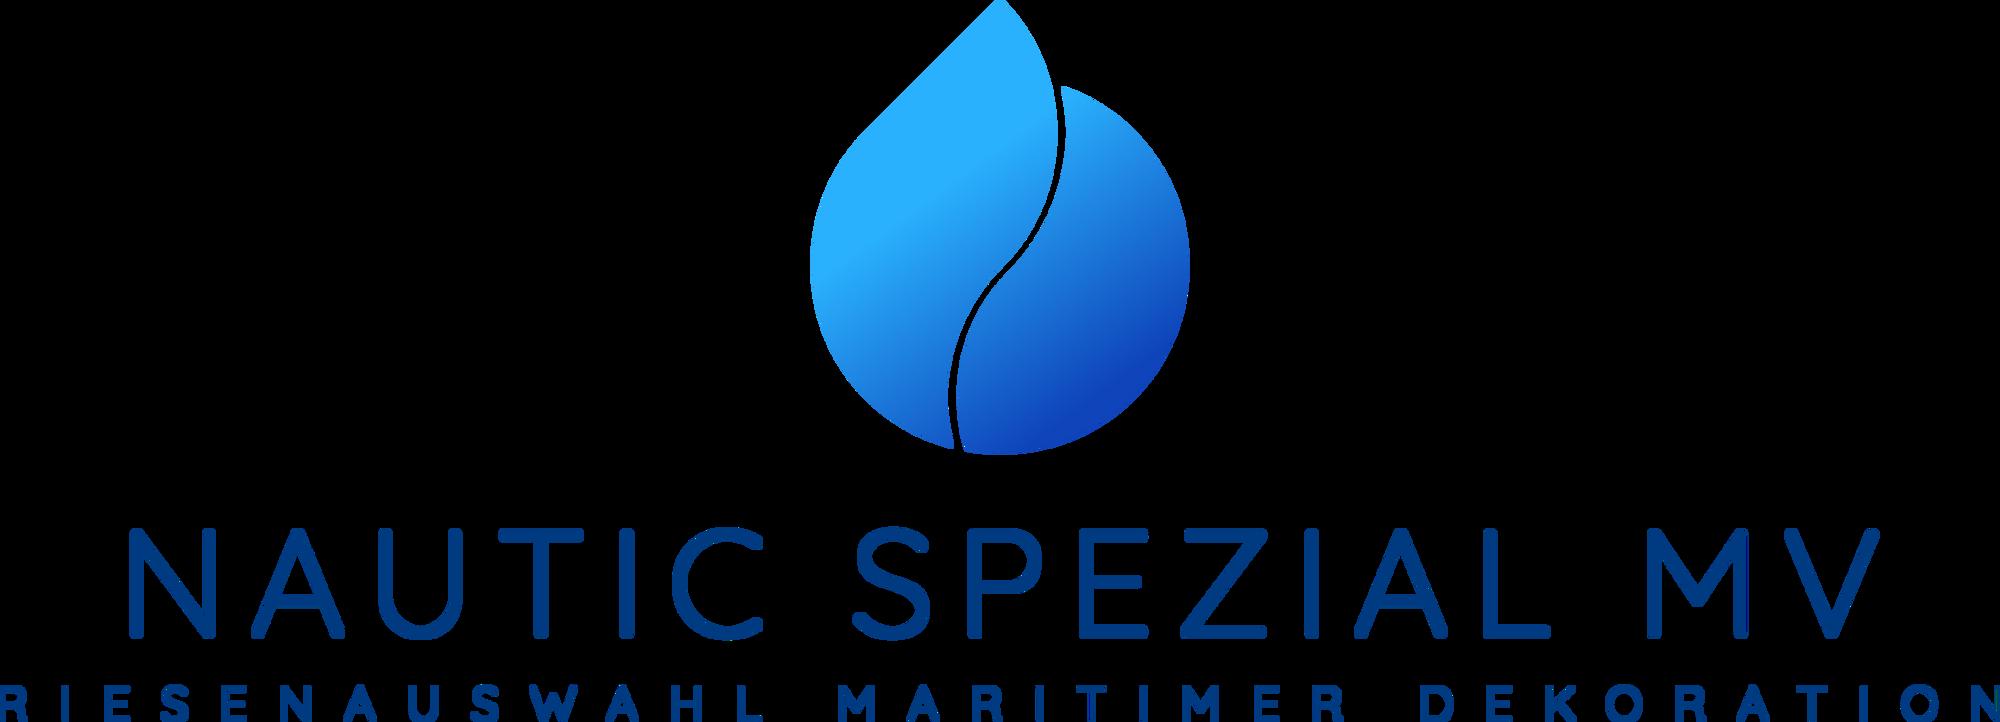 Nautic Spezial MV